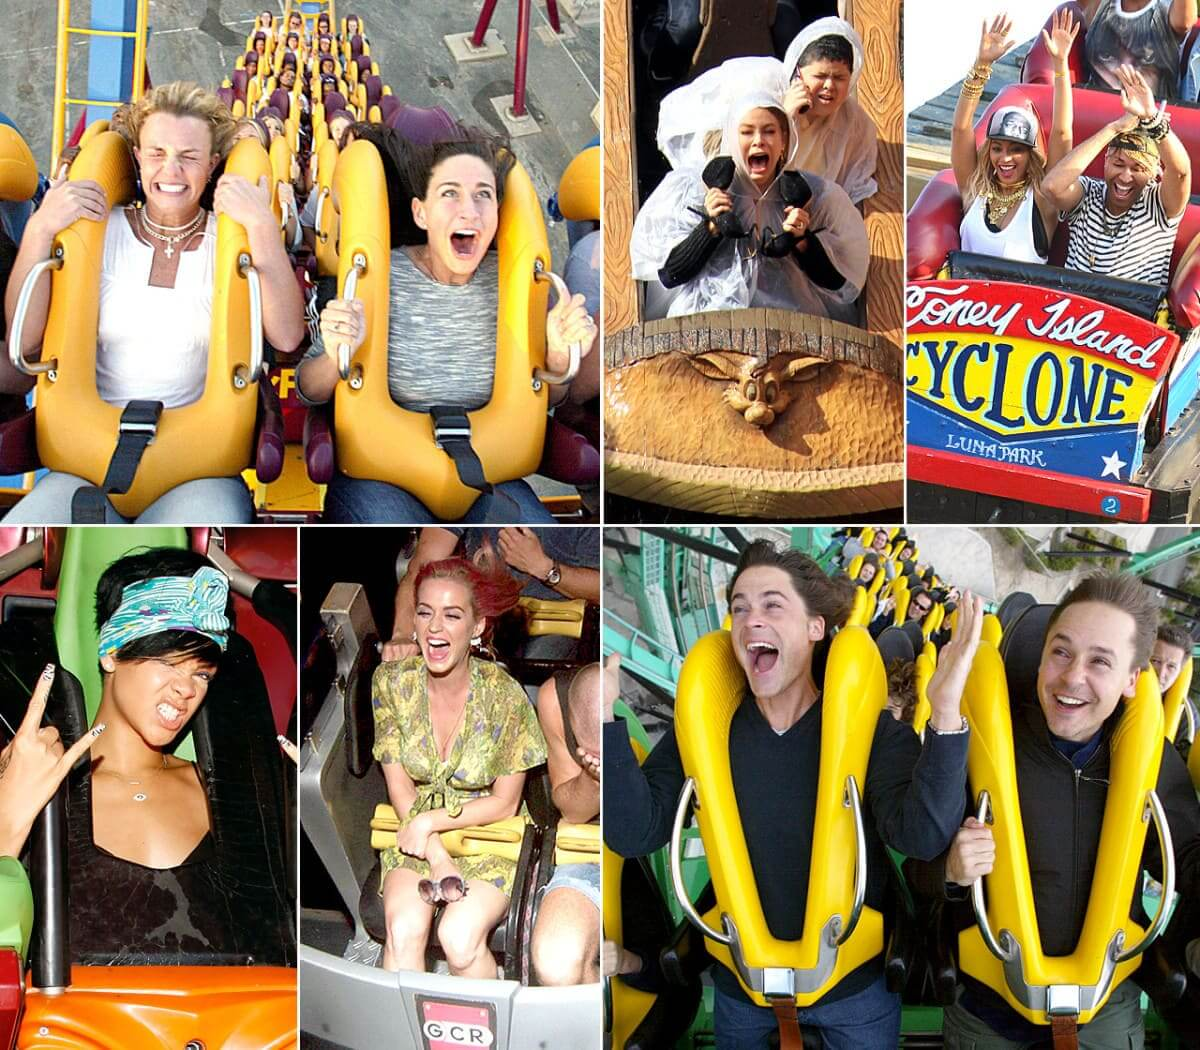 Celebs on roller coasters